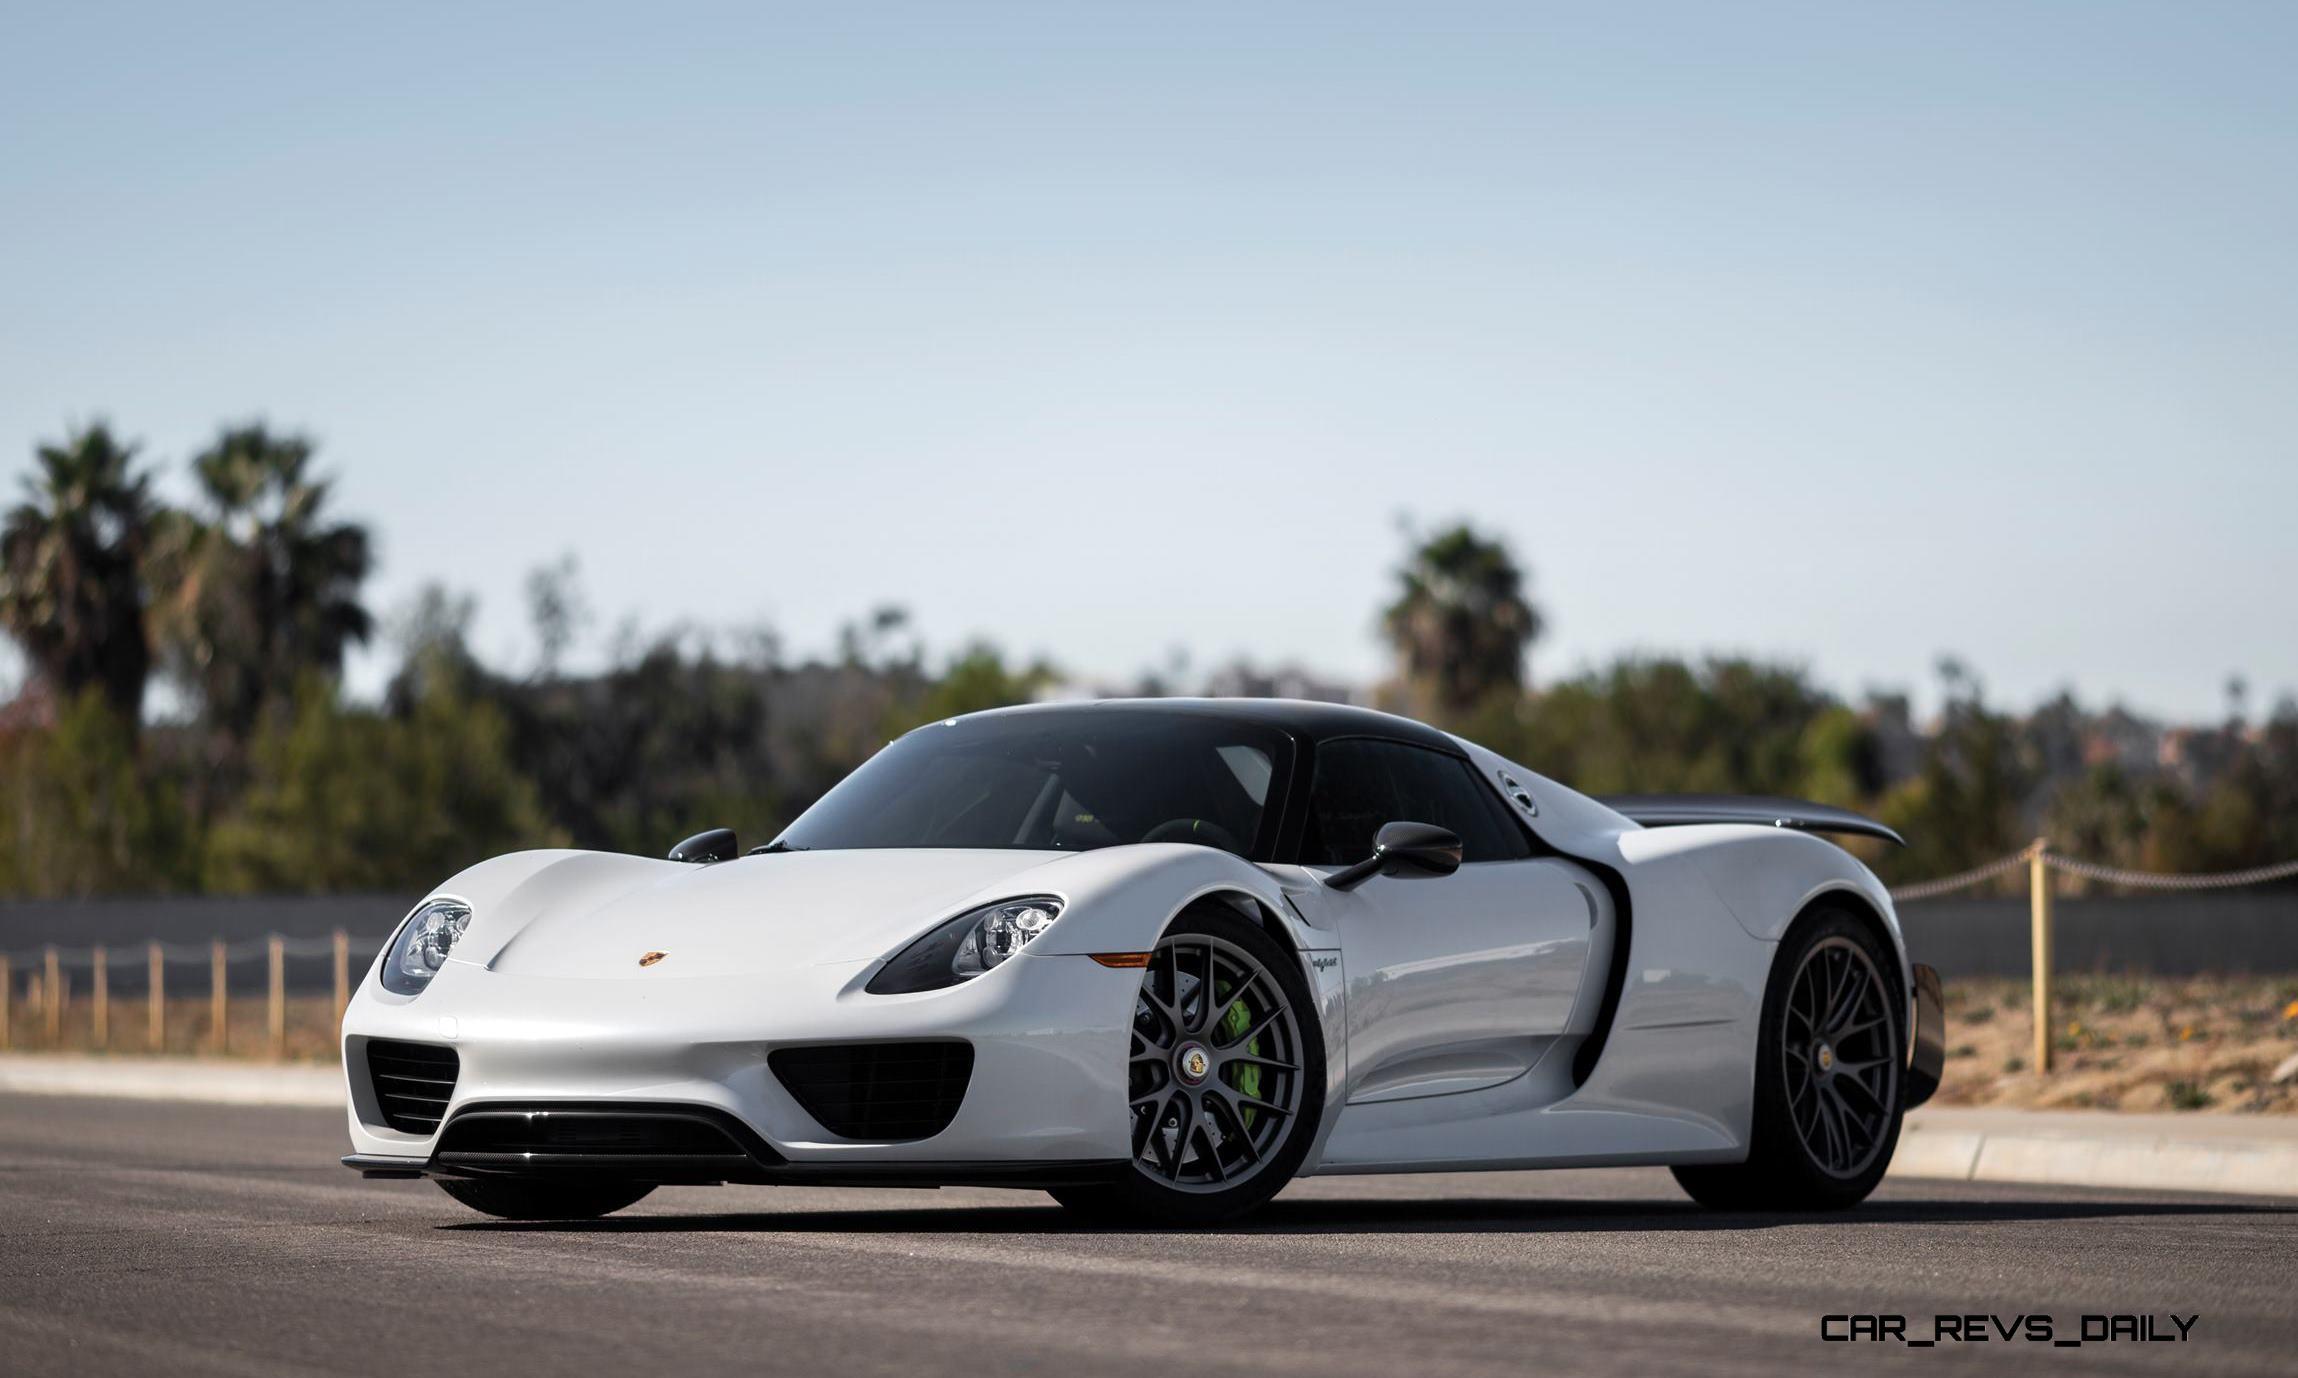 2015-Porsche-918-Spyder-Weissach-Pack-1 Mesmerizing Porsche 918 Spyder with Weissach Package Price Cars Trend